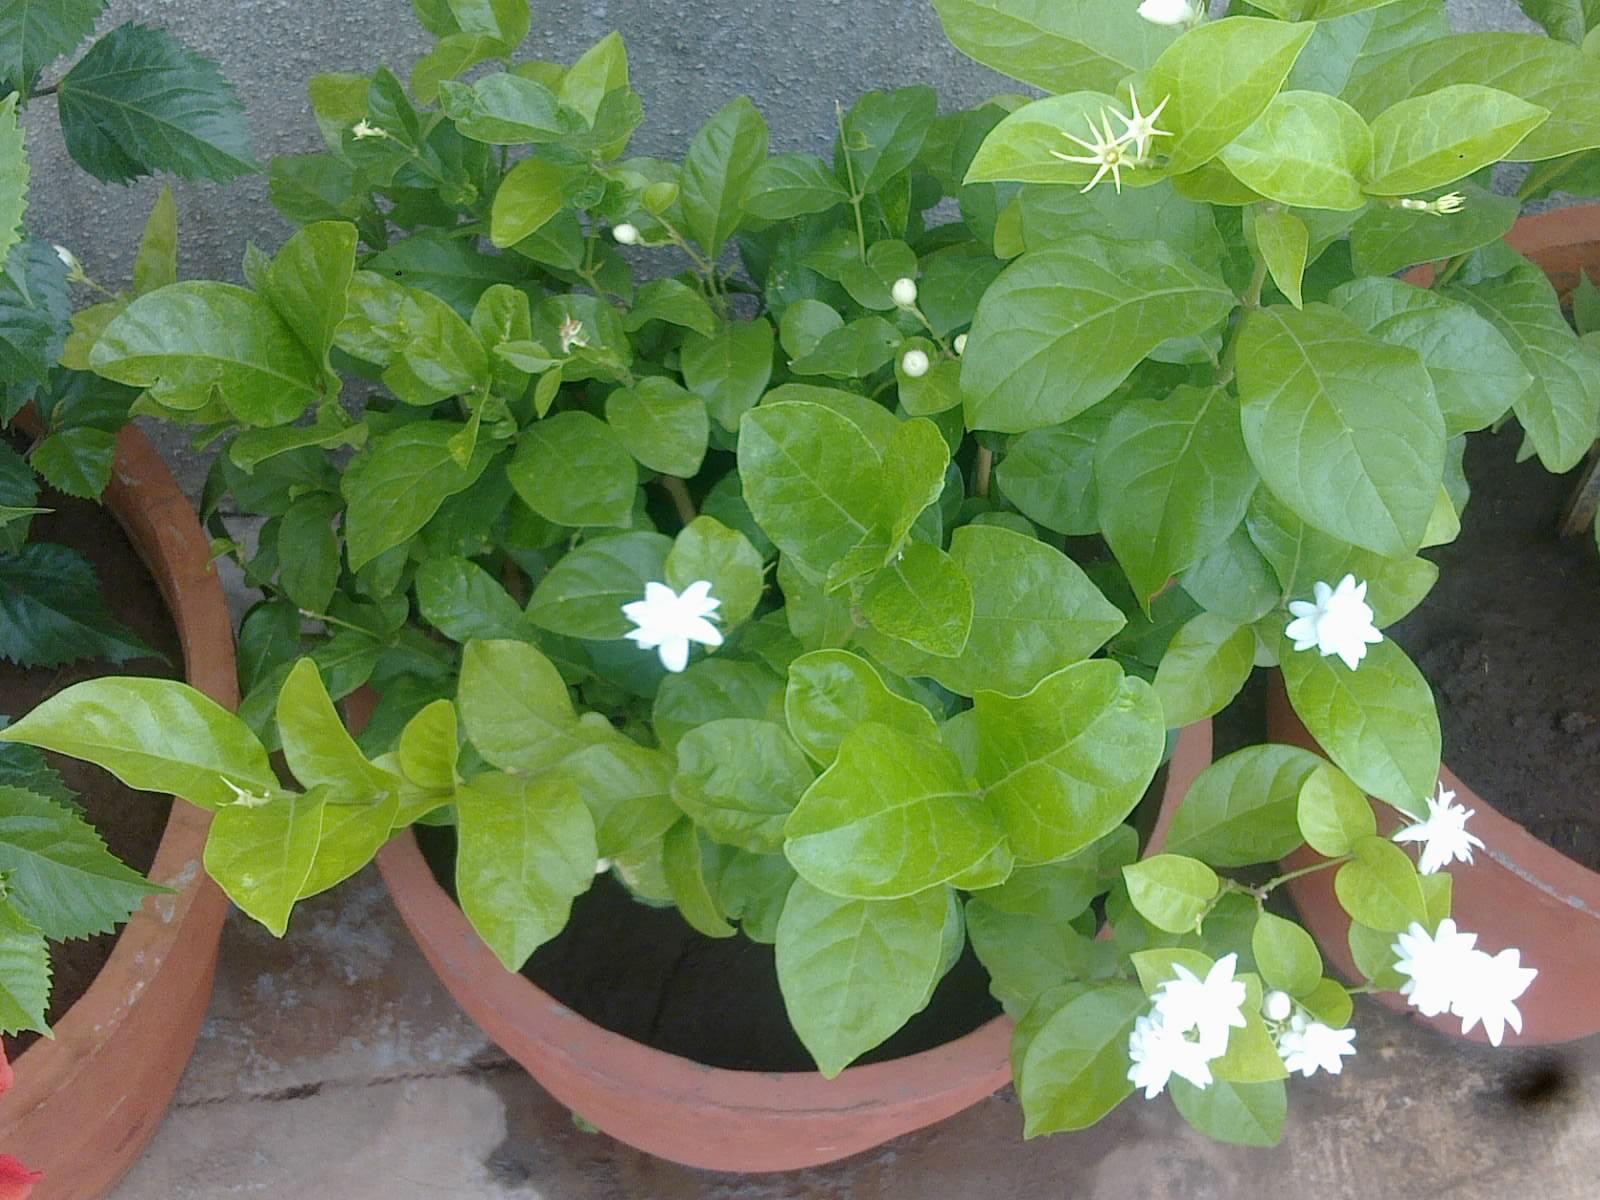 plants growing in my potted garden arabian jasmine blooms. Black Bedroom Furniture Sets. Home Design Ideas